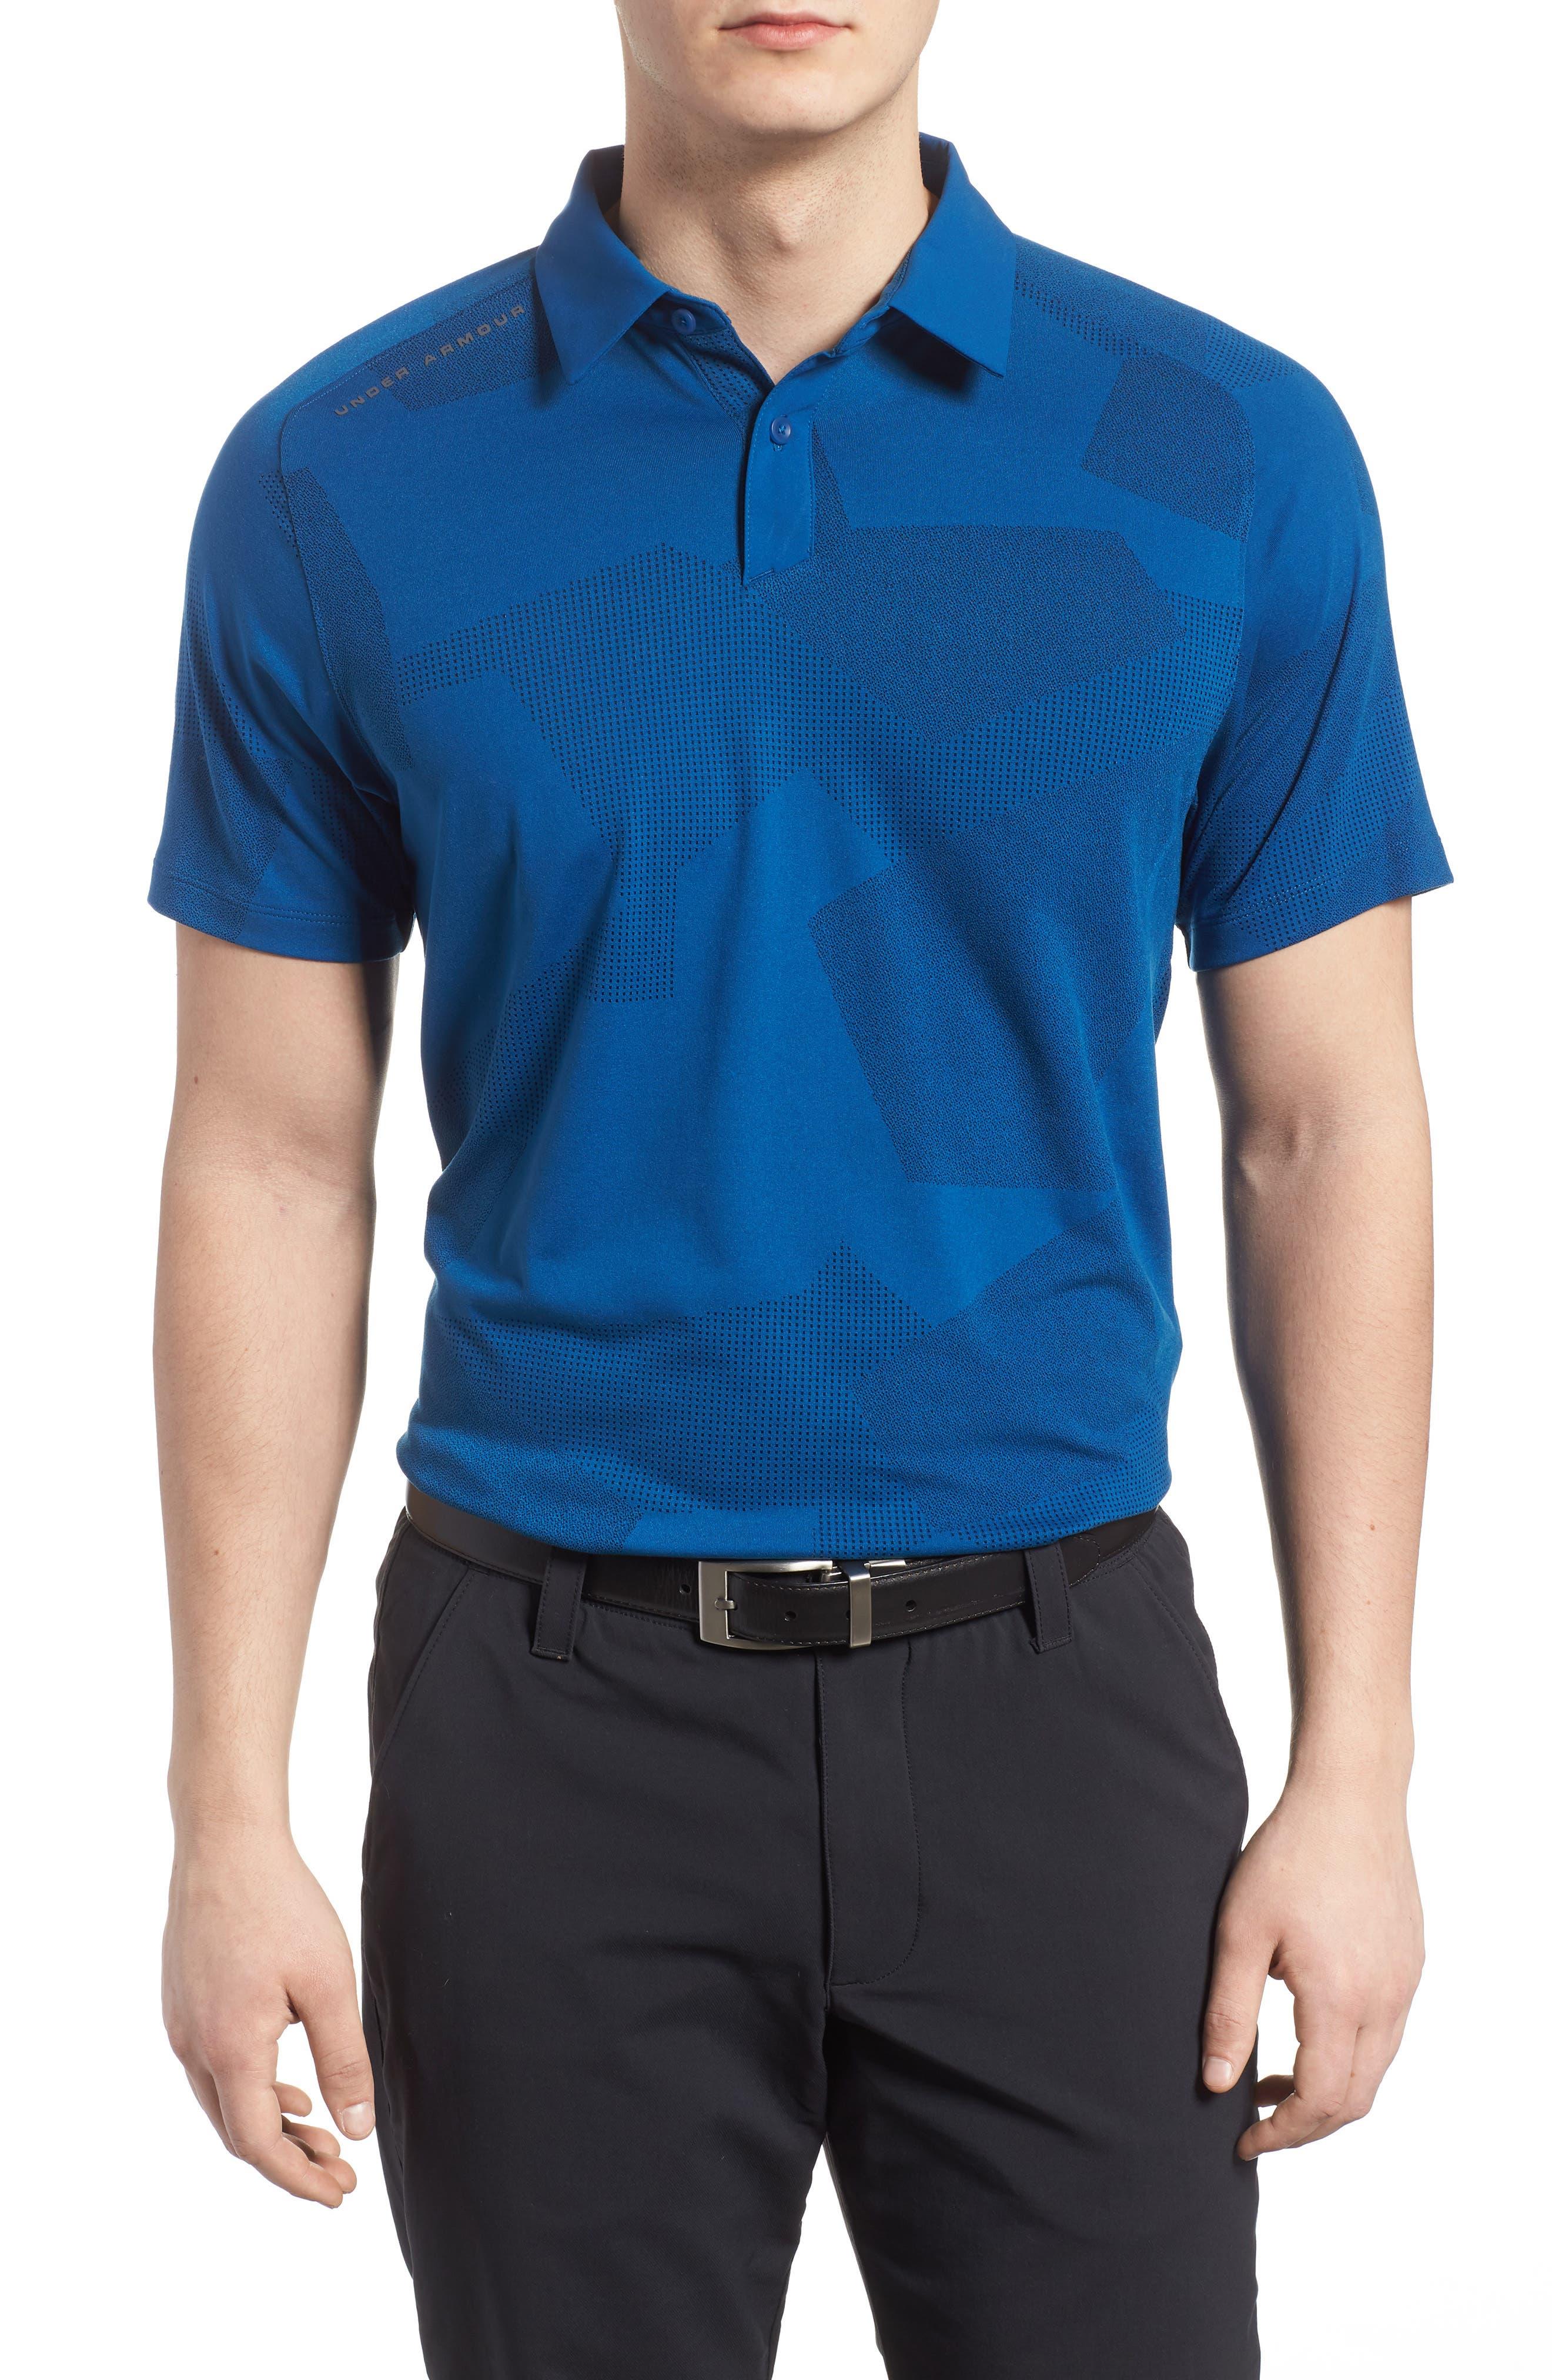 Threadborne Limitless Polo Shirt,                         Main,                         color, 487 Mrccan Blu Rhno Gry